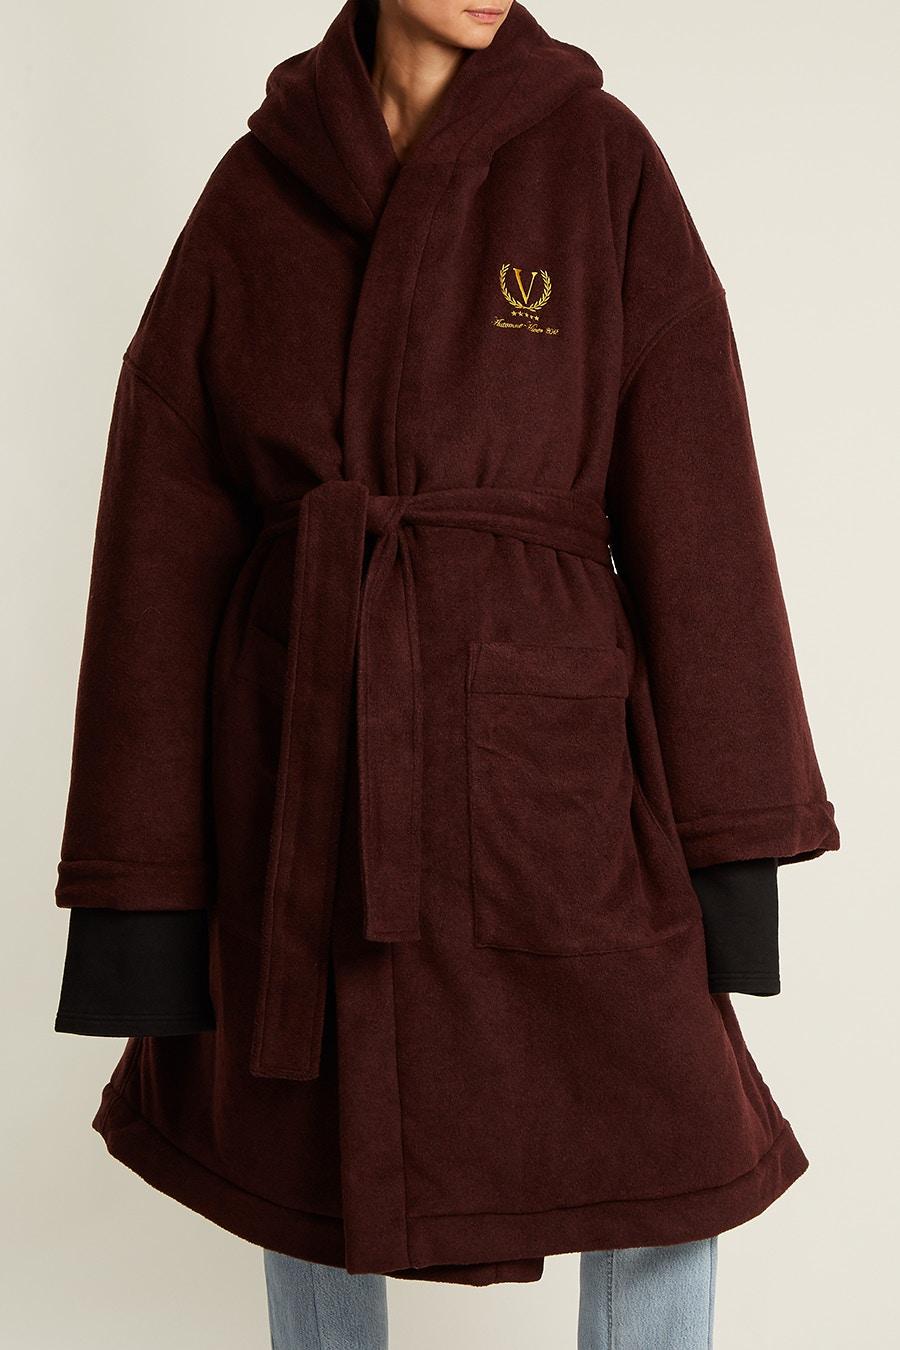 vetements robe coat